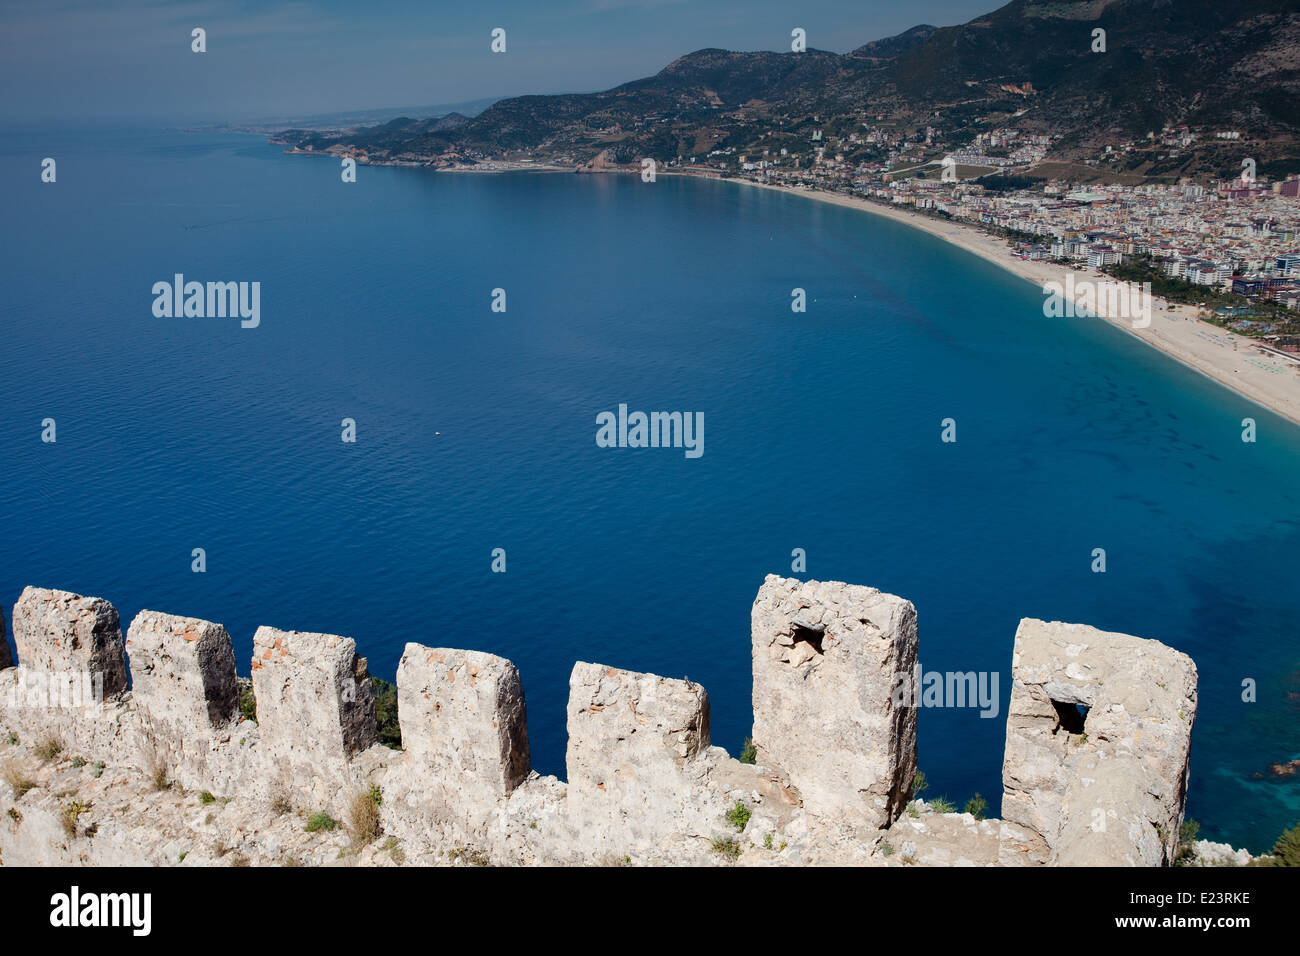 Alanya Castle - Stock Image